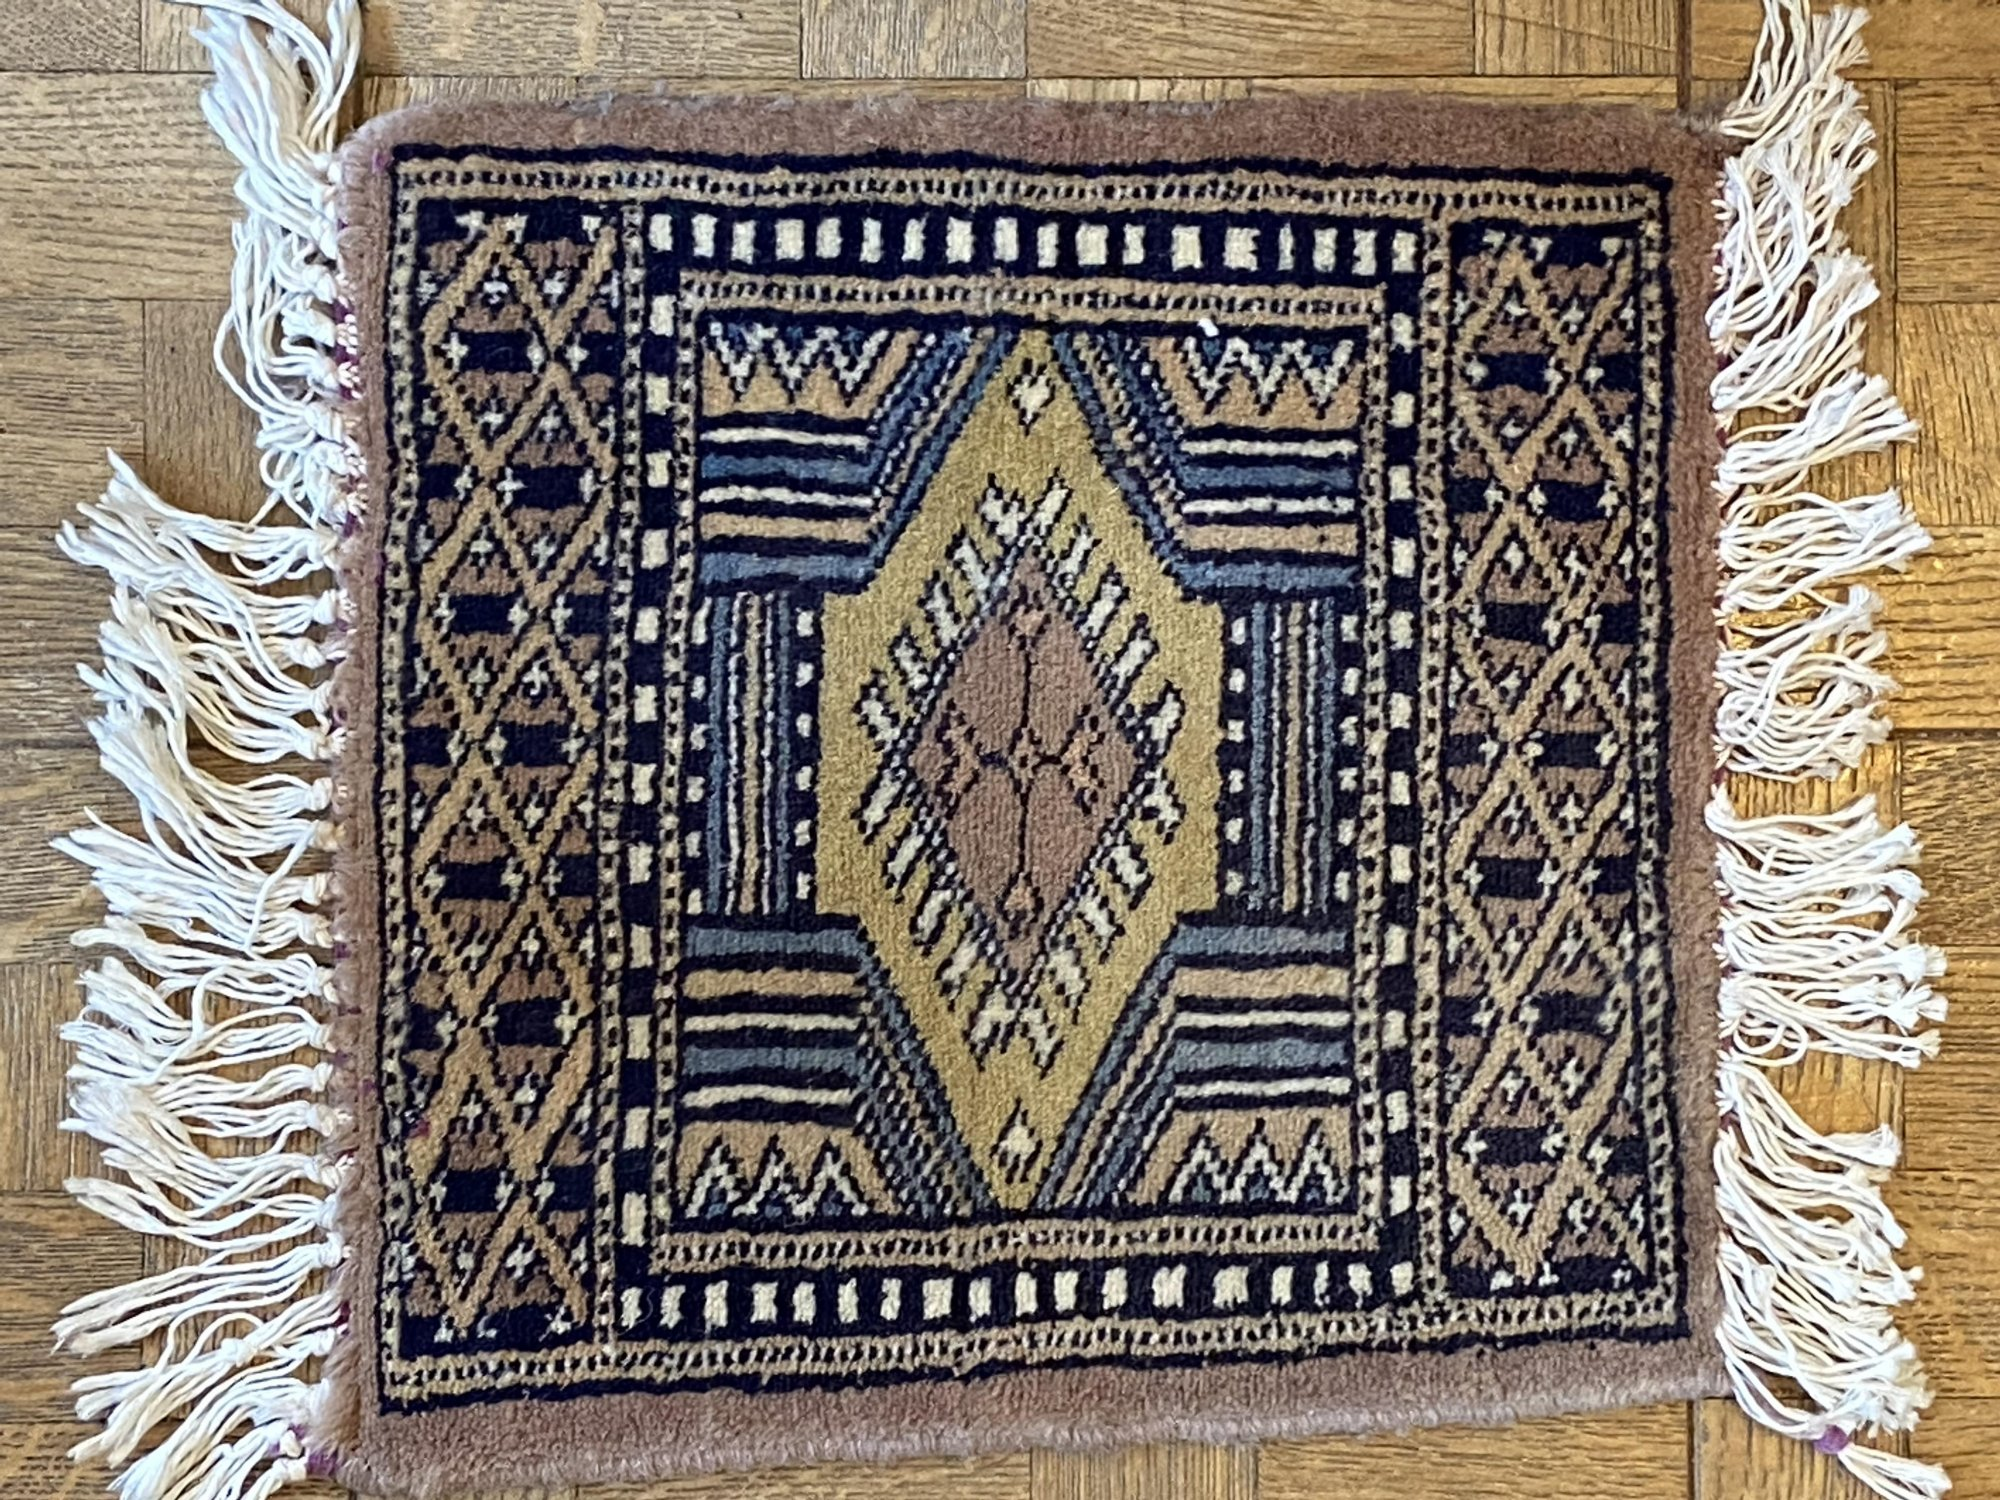 12 X 16 Miniature Gashgai rug, brown and black  PXY